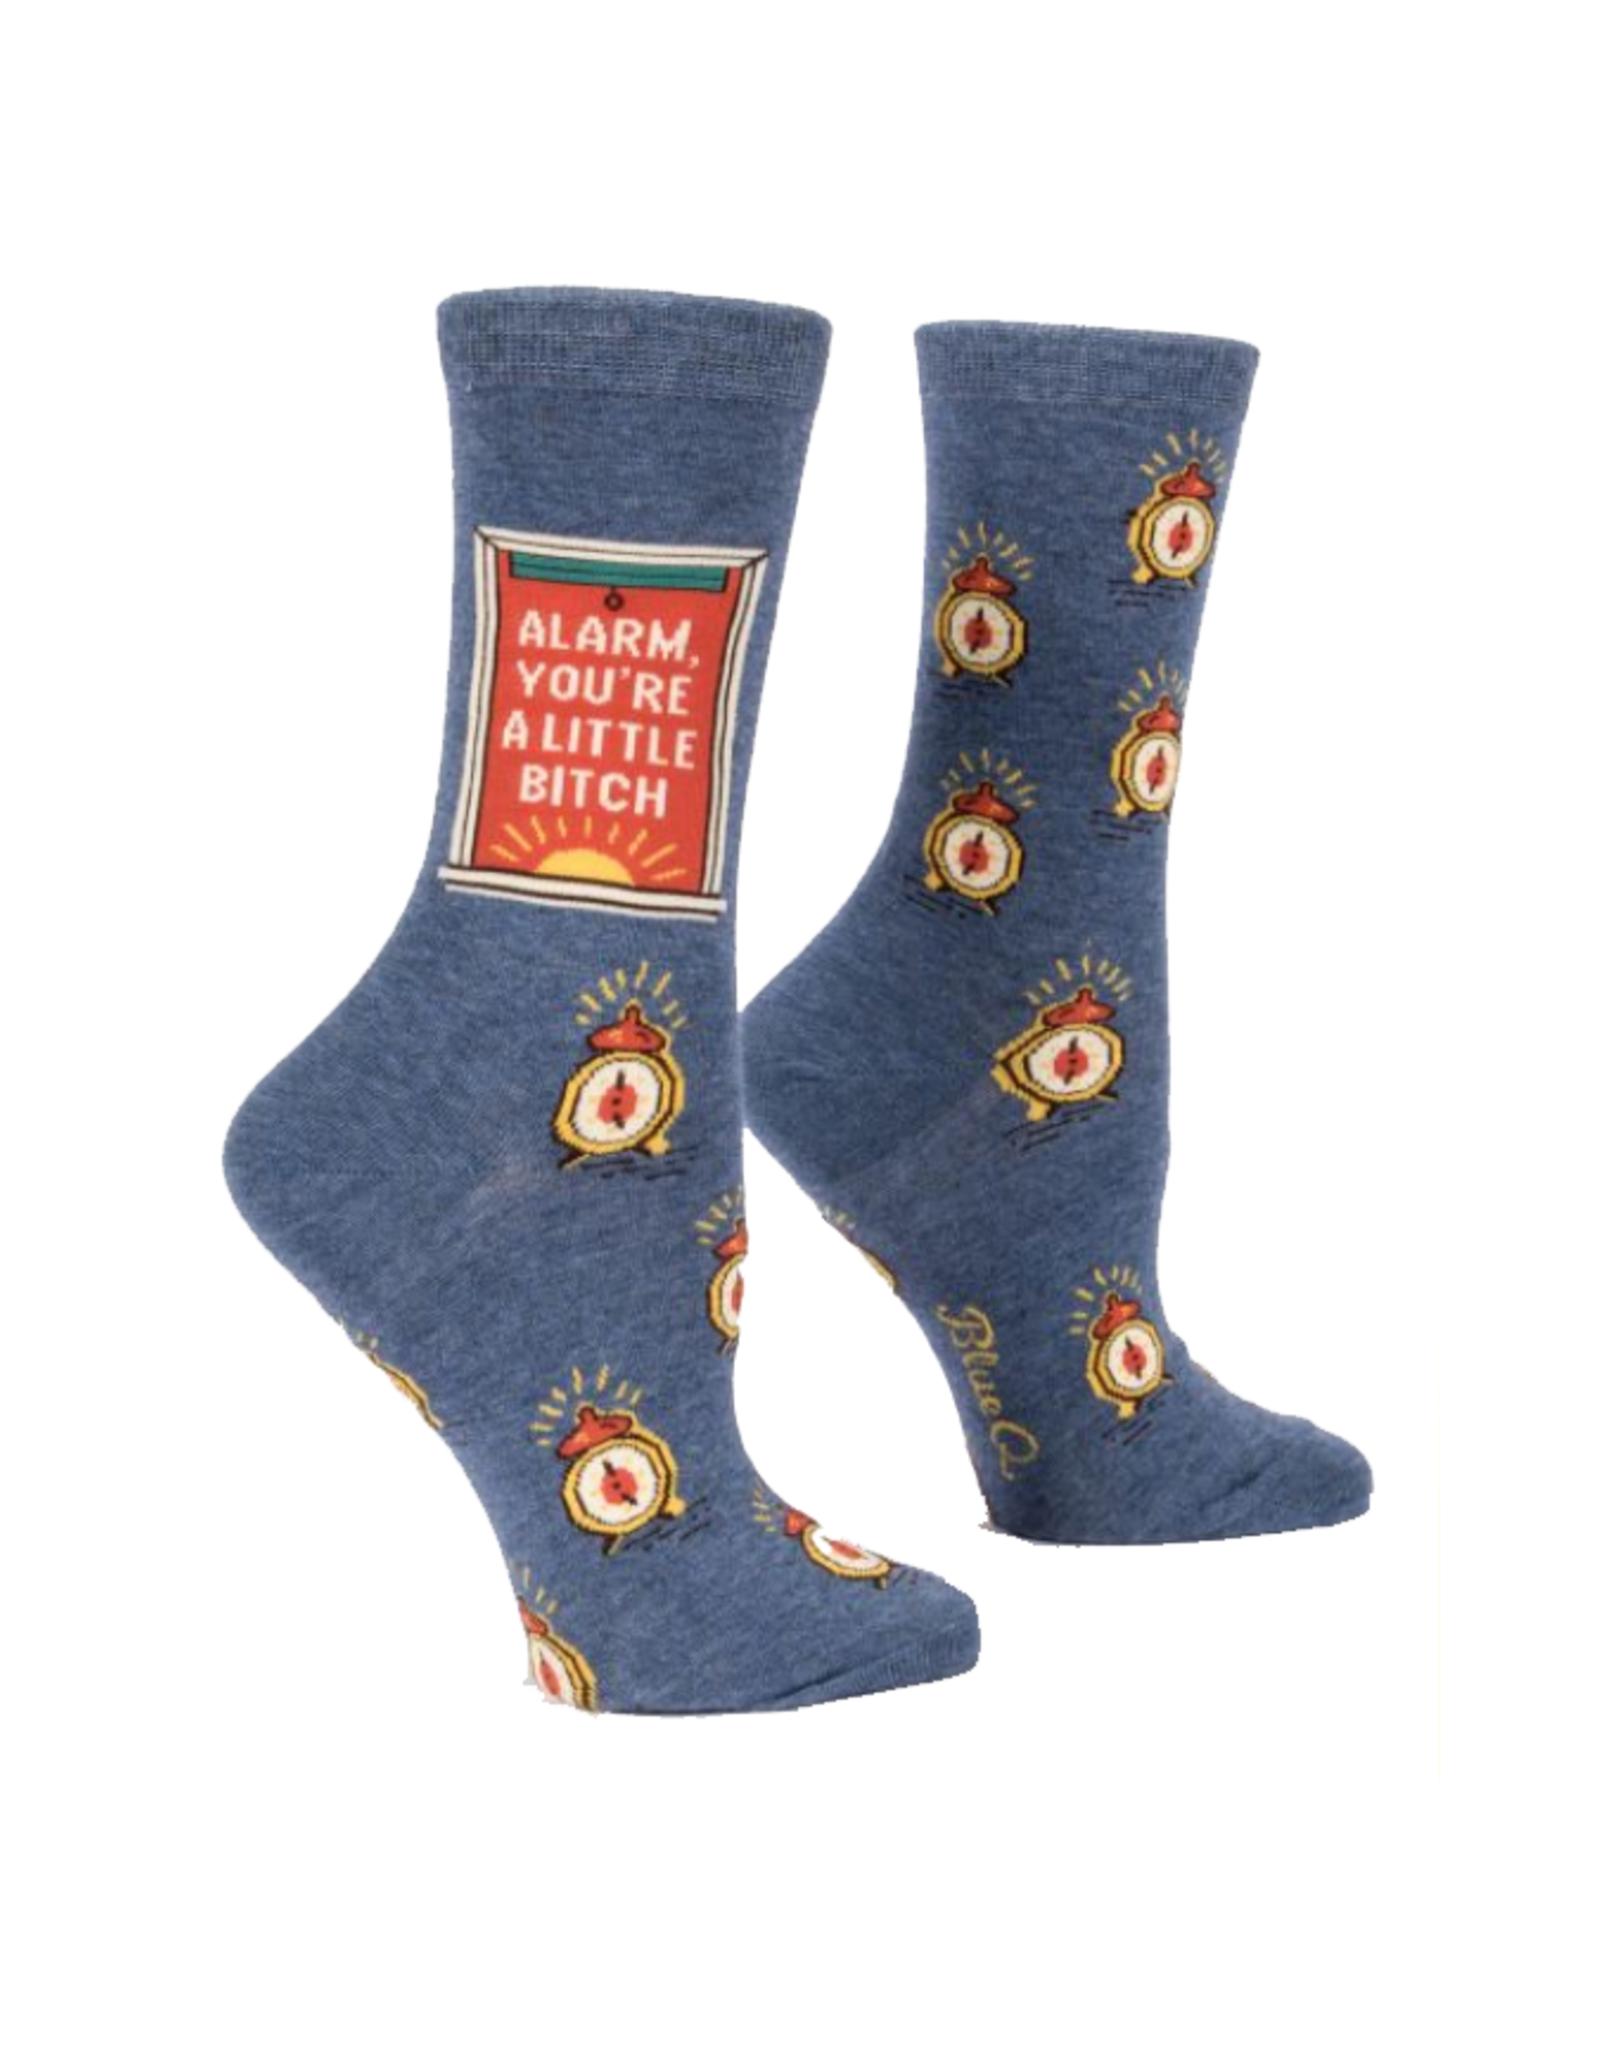 Alarm, You're A Little Bitch Women's Crew Socks